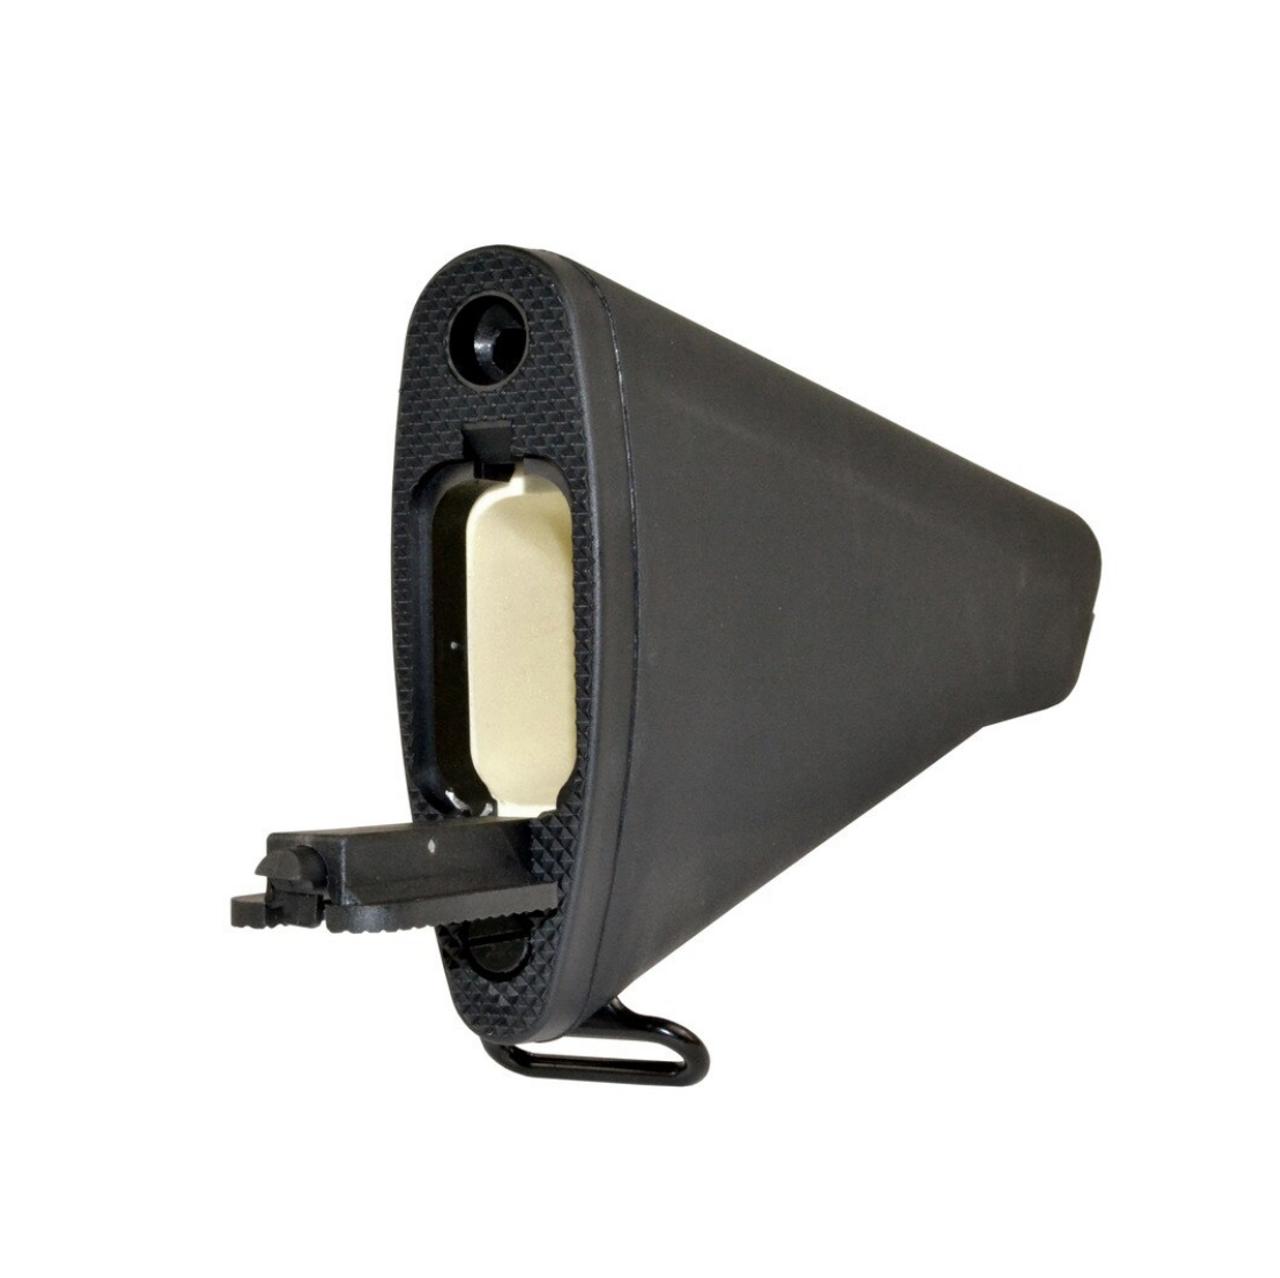 A2 Style AR-15 Fixed Stock Black